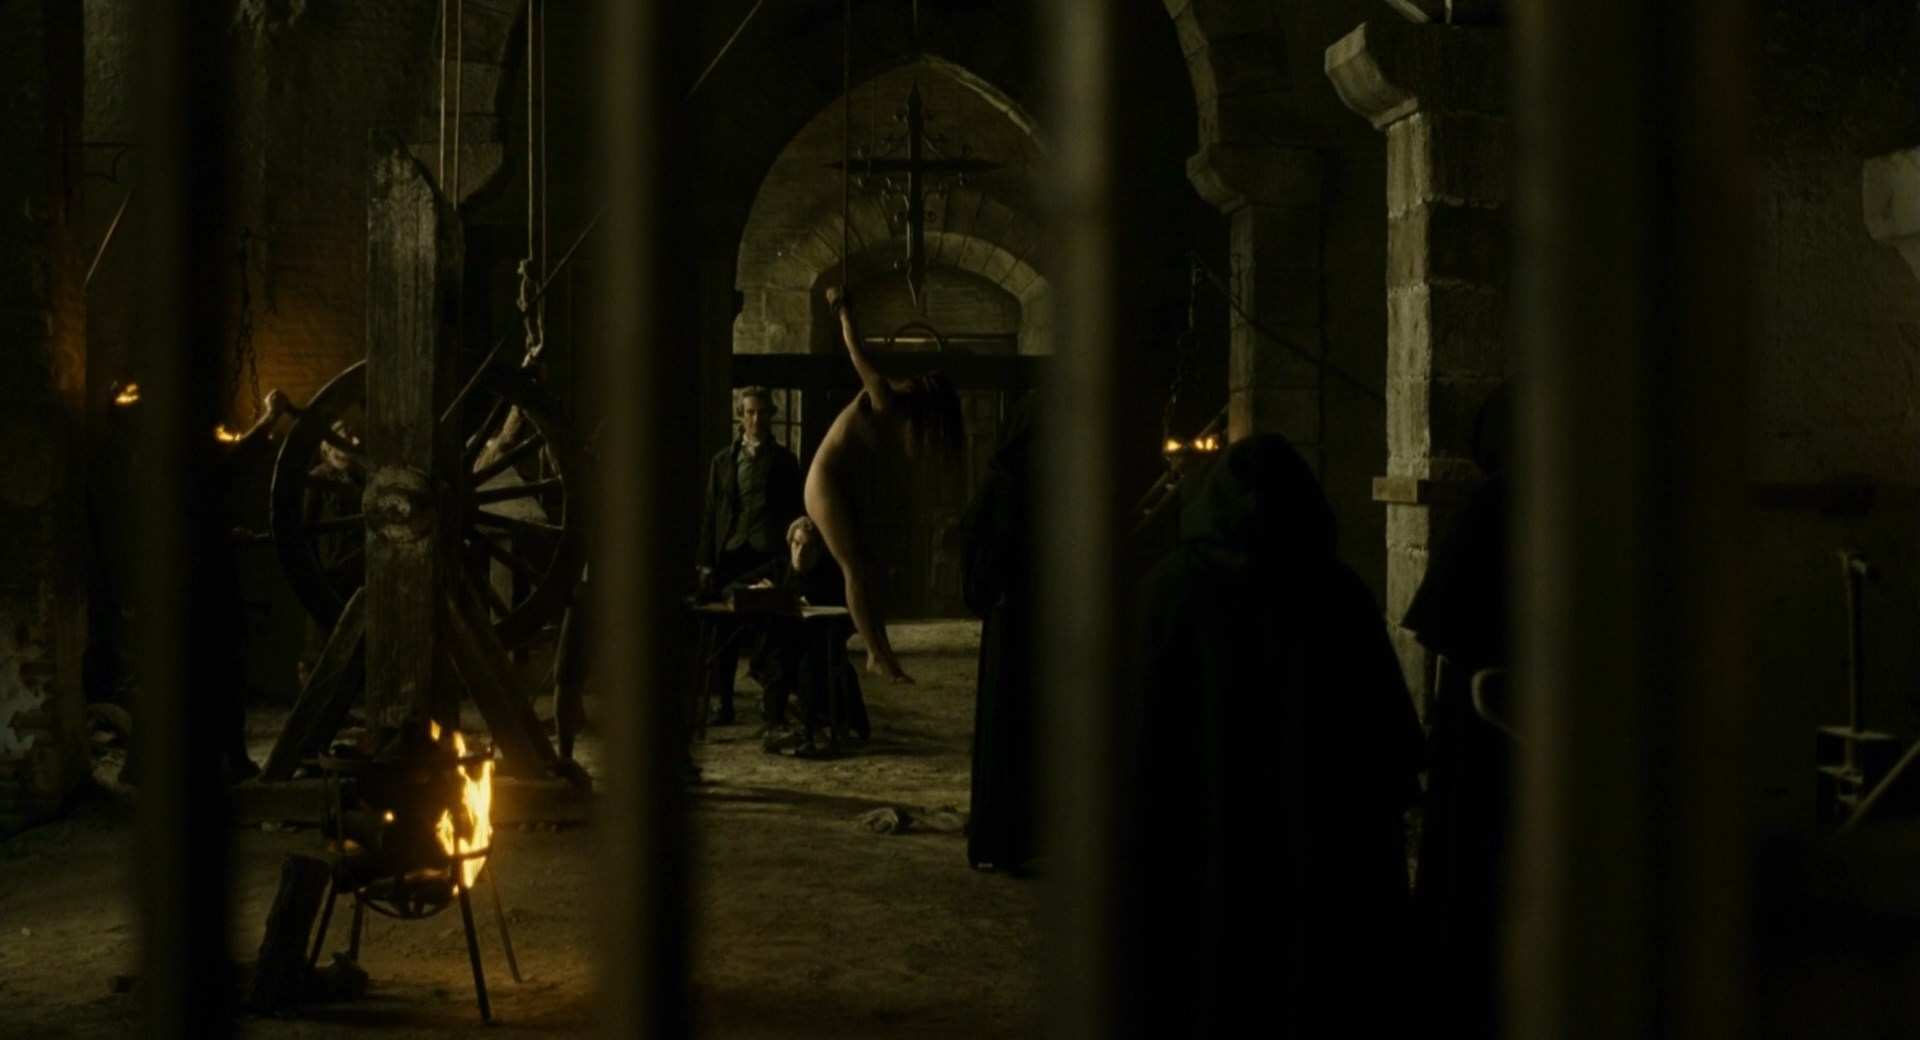 Natalie portman nude scene goyas ghosts series - 2019 year